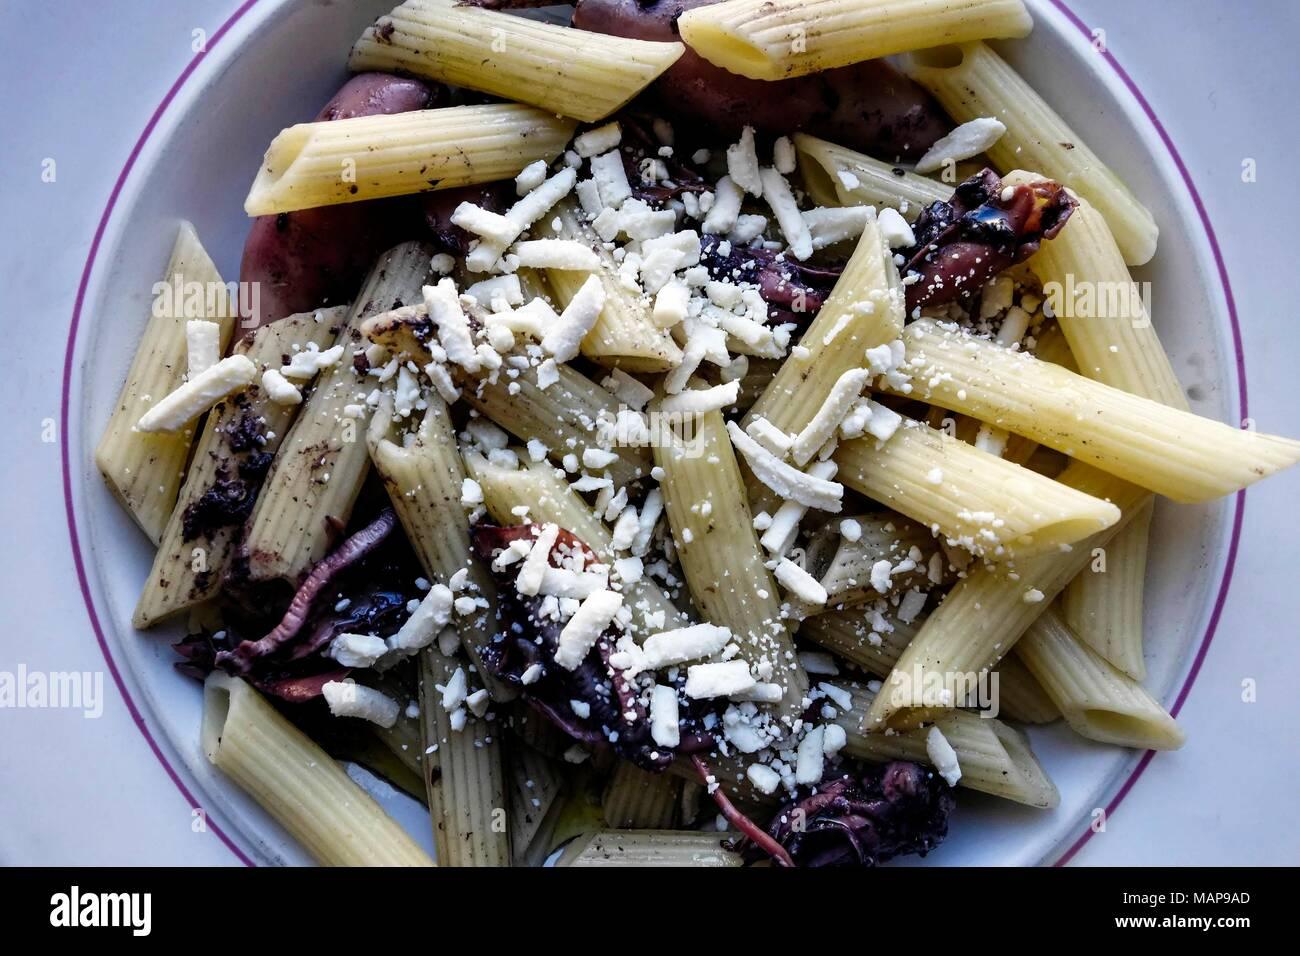 Pasta and Calamari - Stock Image